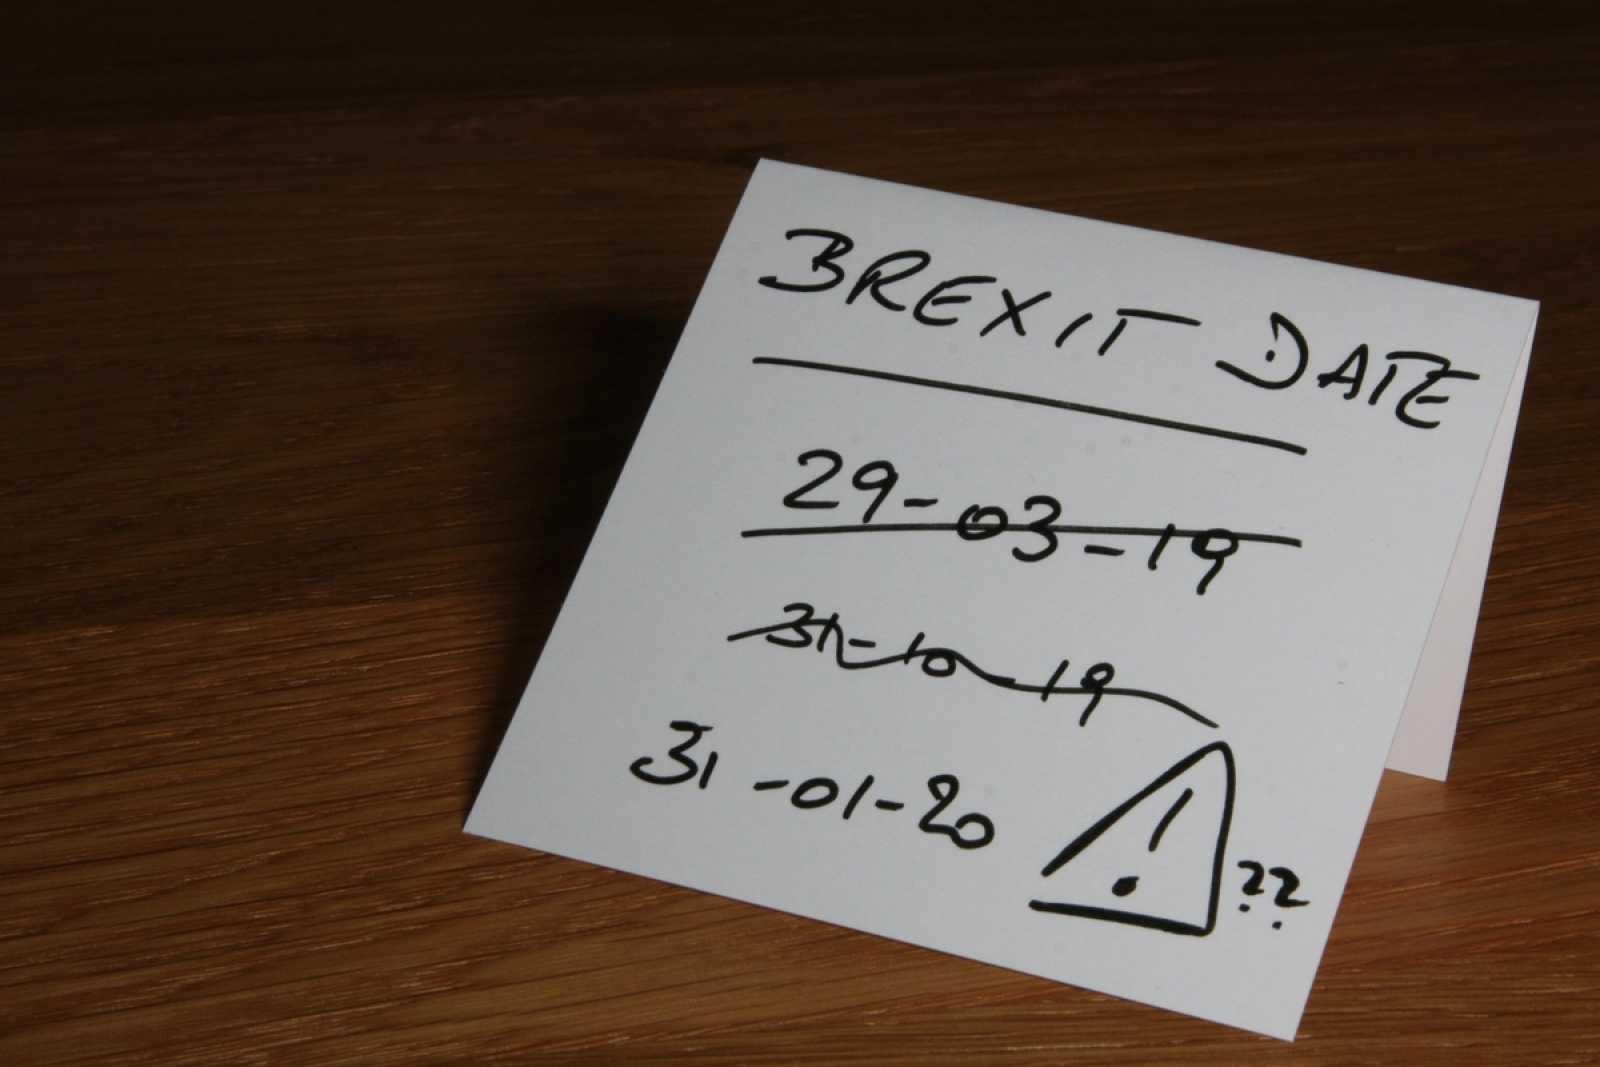 Brext dates